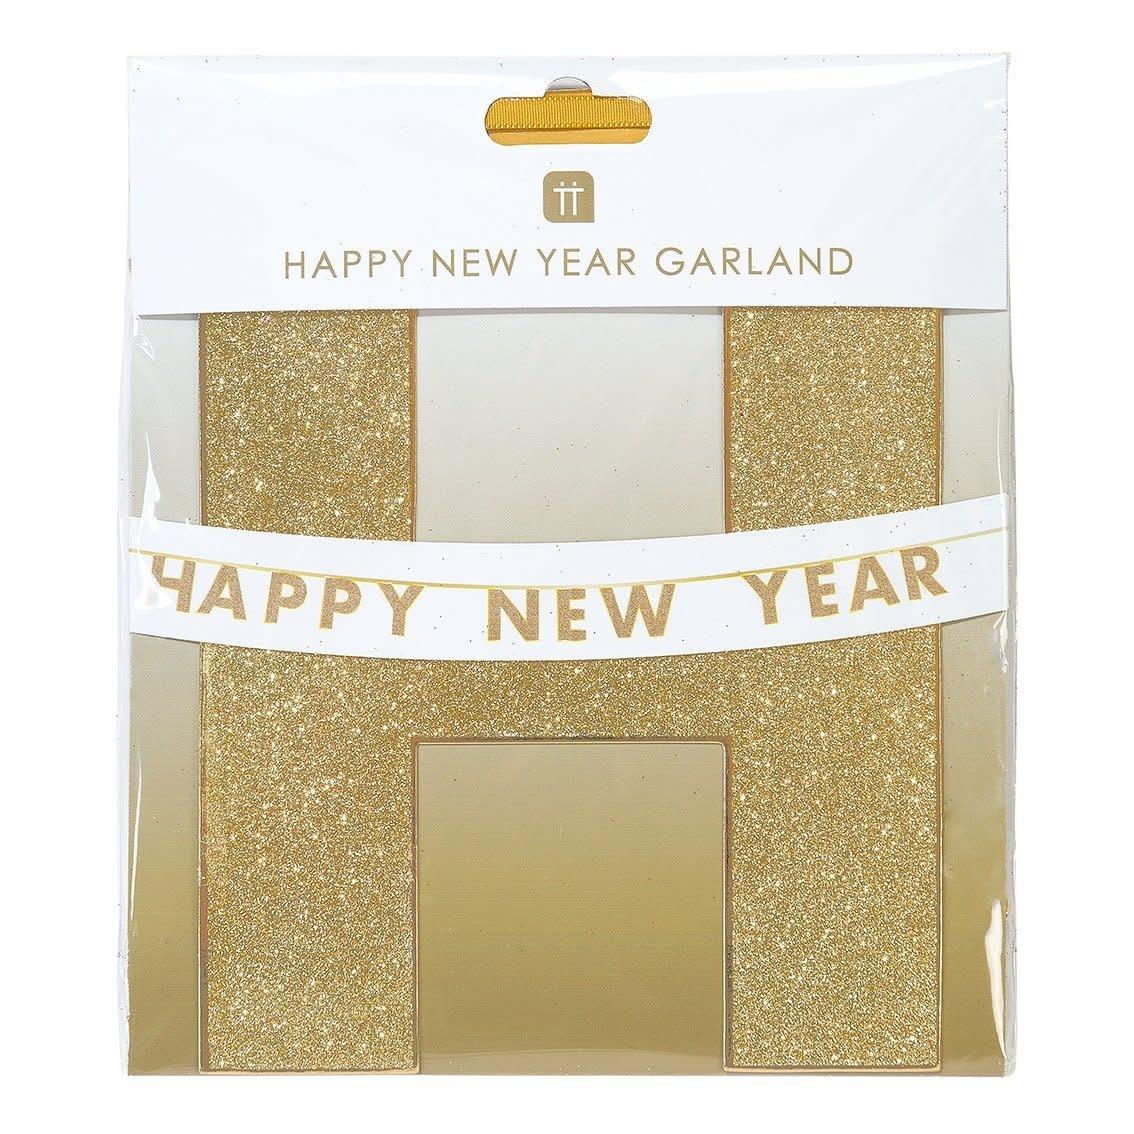 TT HAPPY NEW YEAR GOLD GLITTER GARLAND